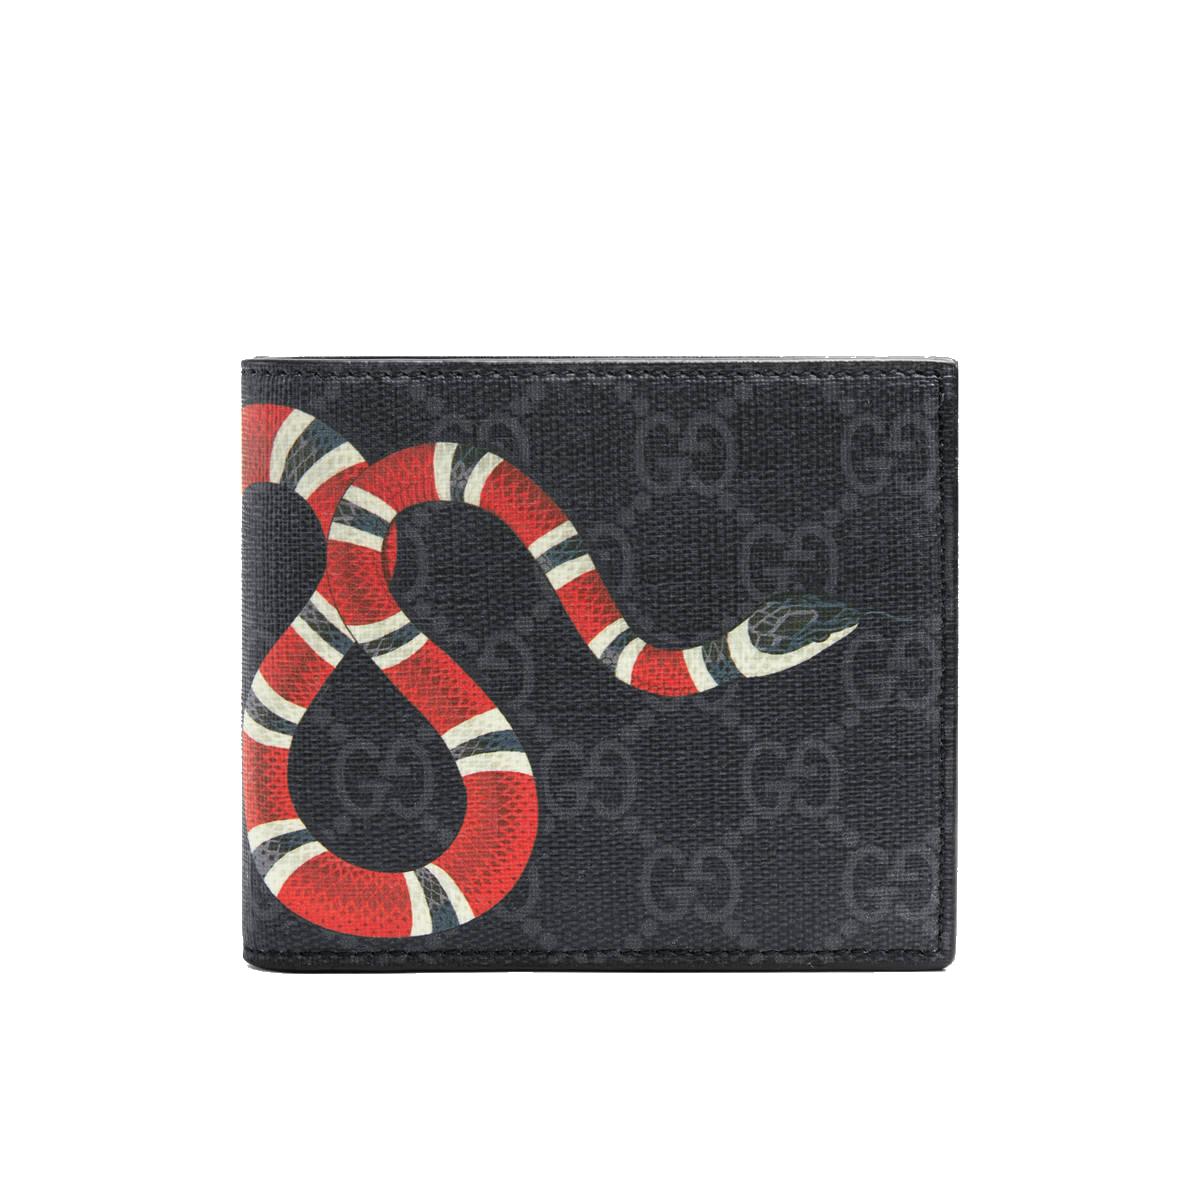 81511797f8b5 Gucci Kingsnake print GG Supreme wallet